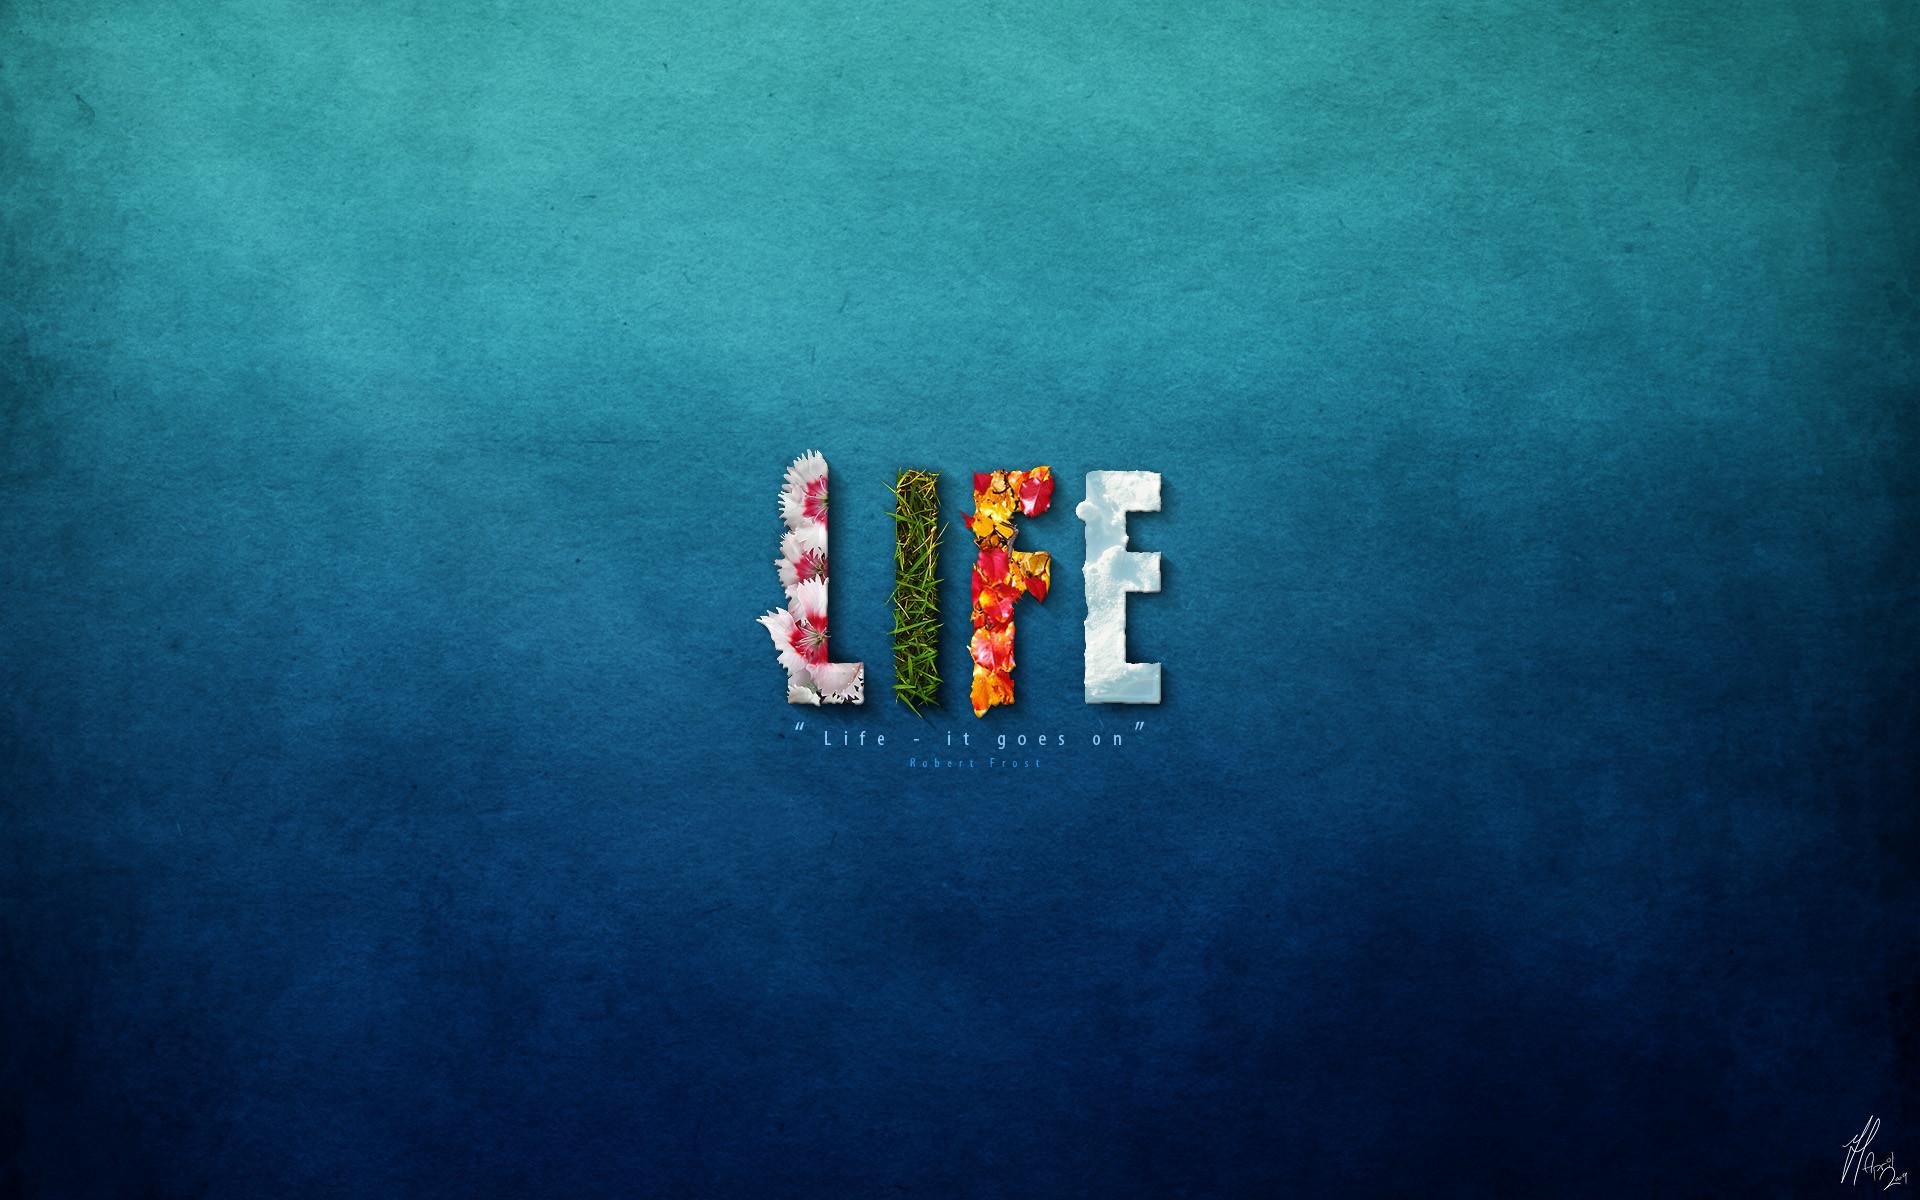 Life by mushir on DeviantArt